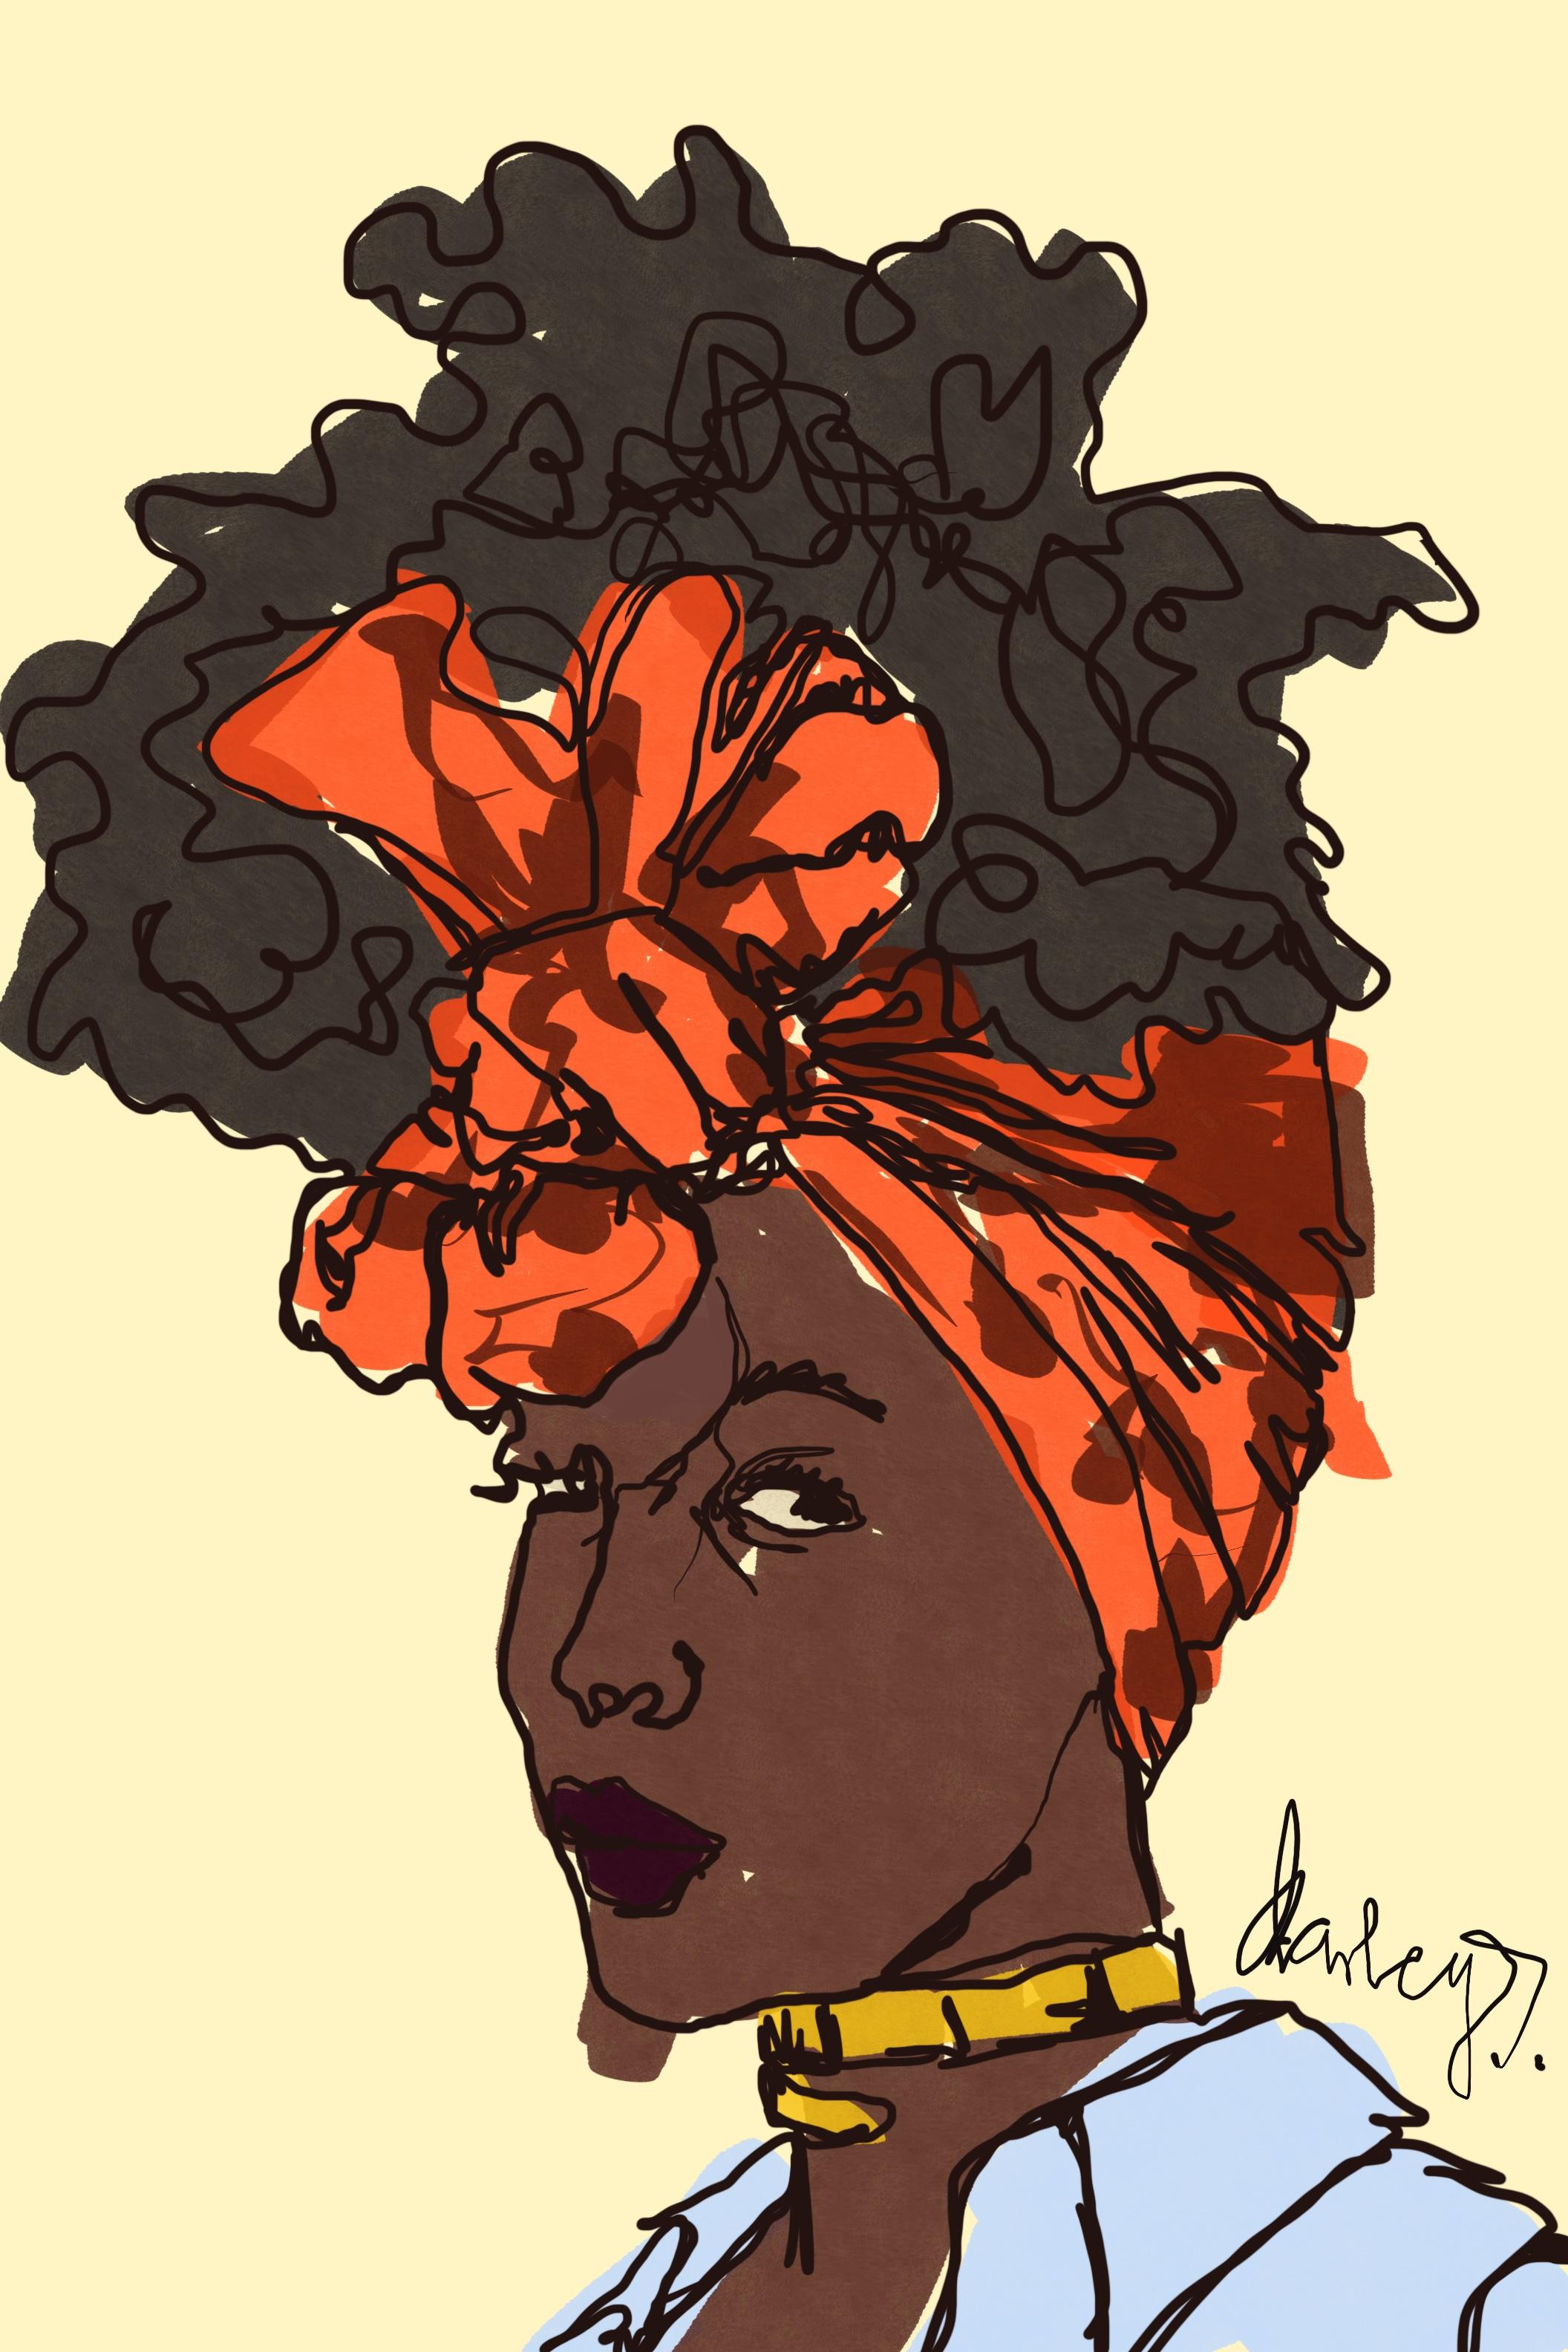 Artwork by Darley Sackitey